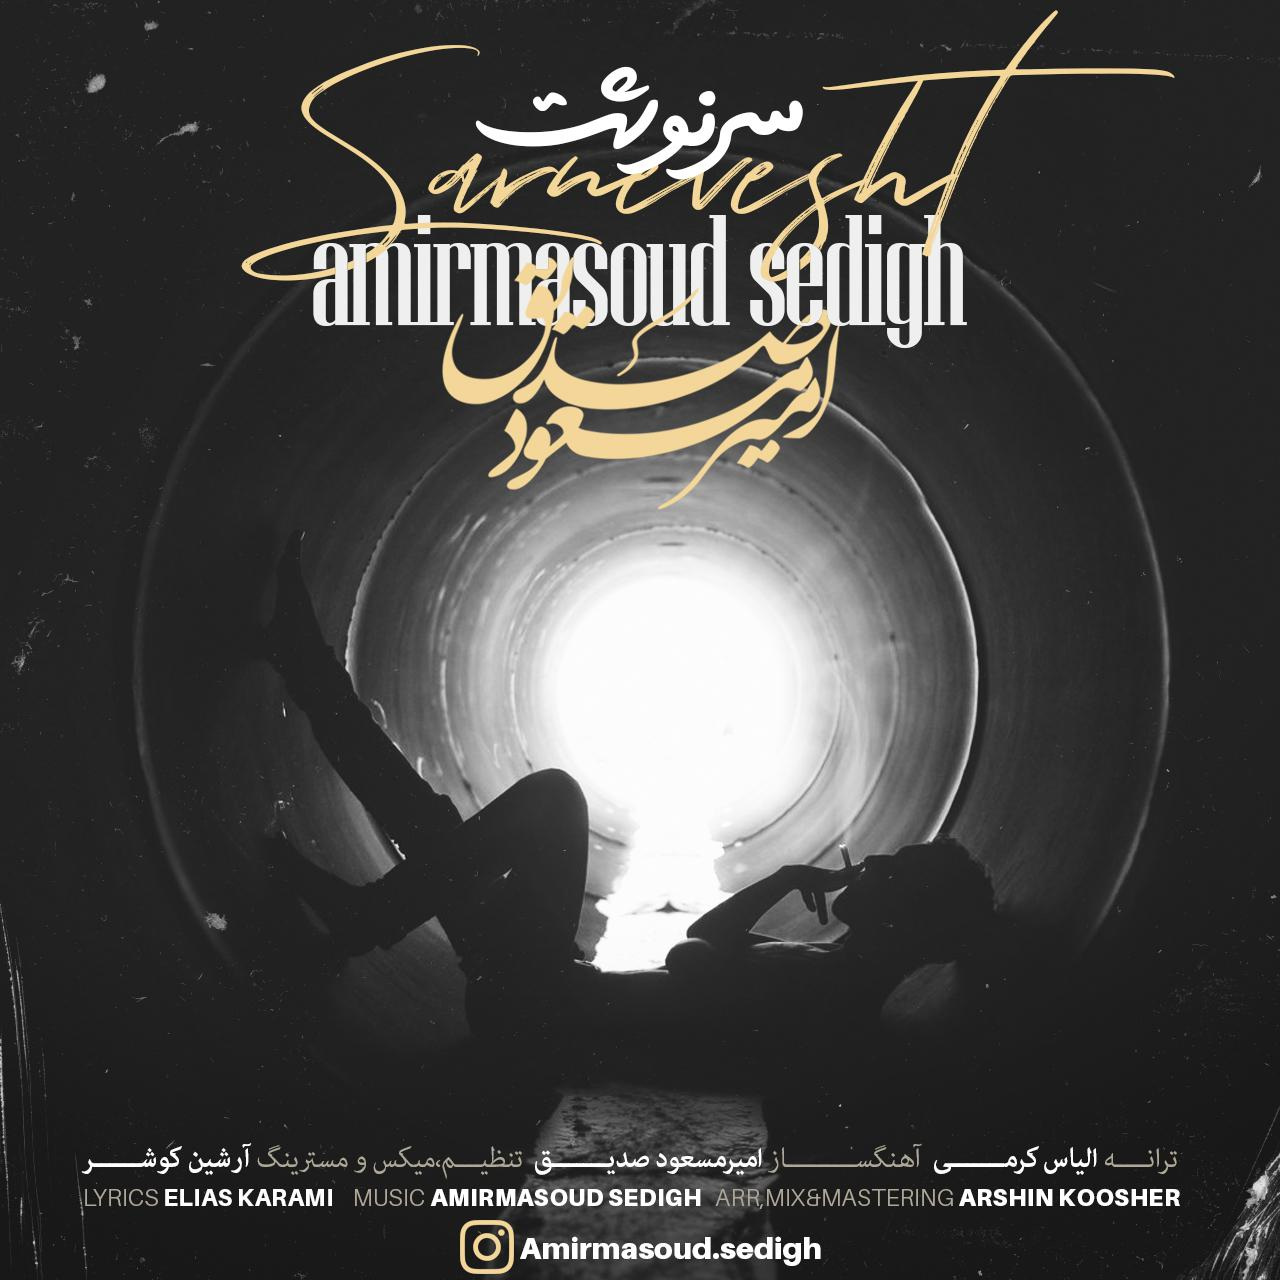 Amir Masoud Sedigh – Sarnevesht